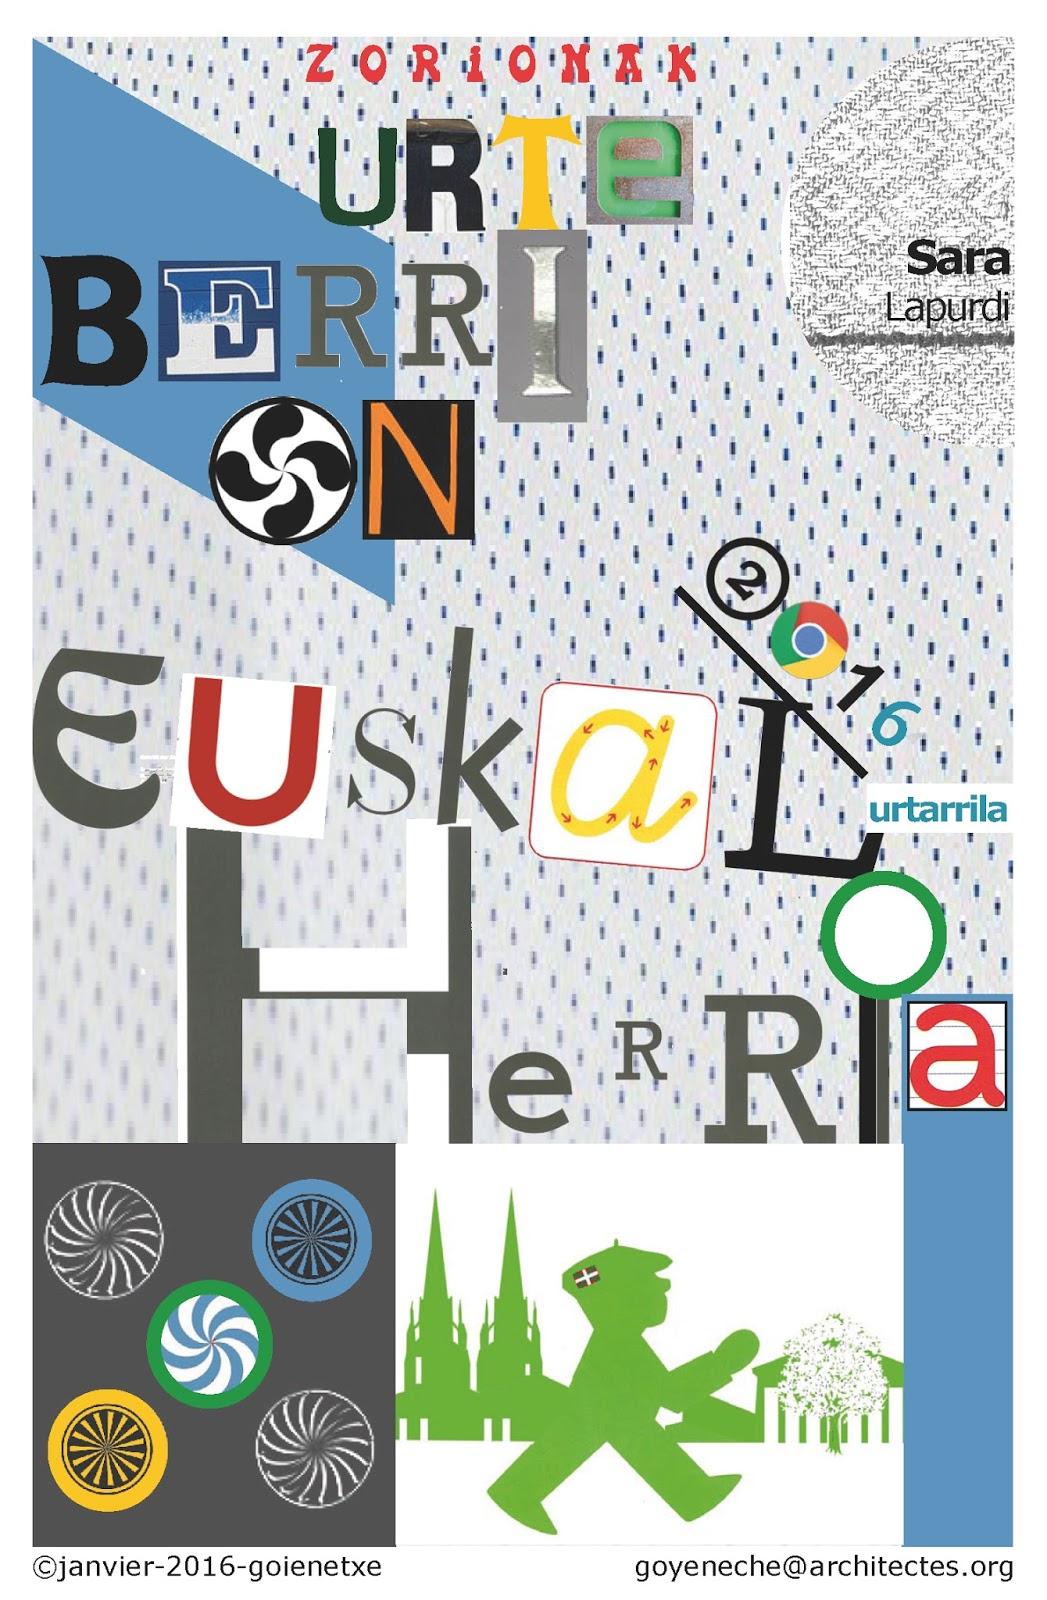 syndicat architectes pays basque 64. Black Bedroom Furniture Sets. Home Design Ideas